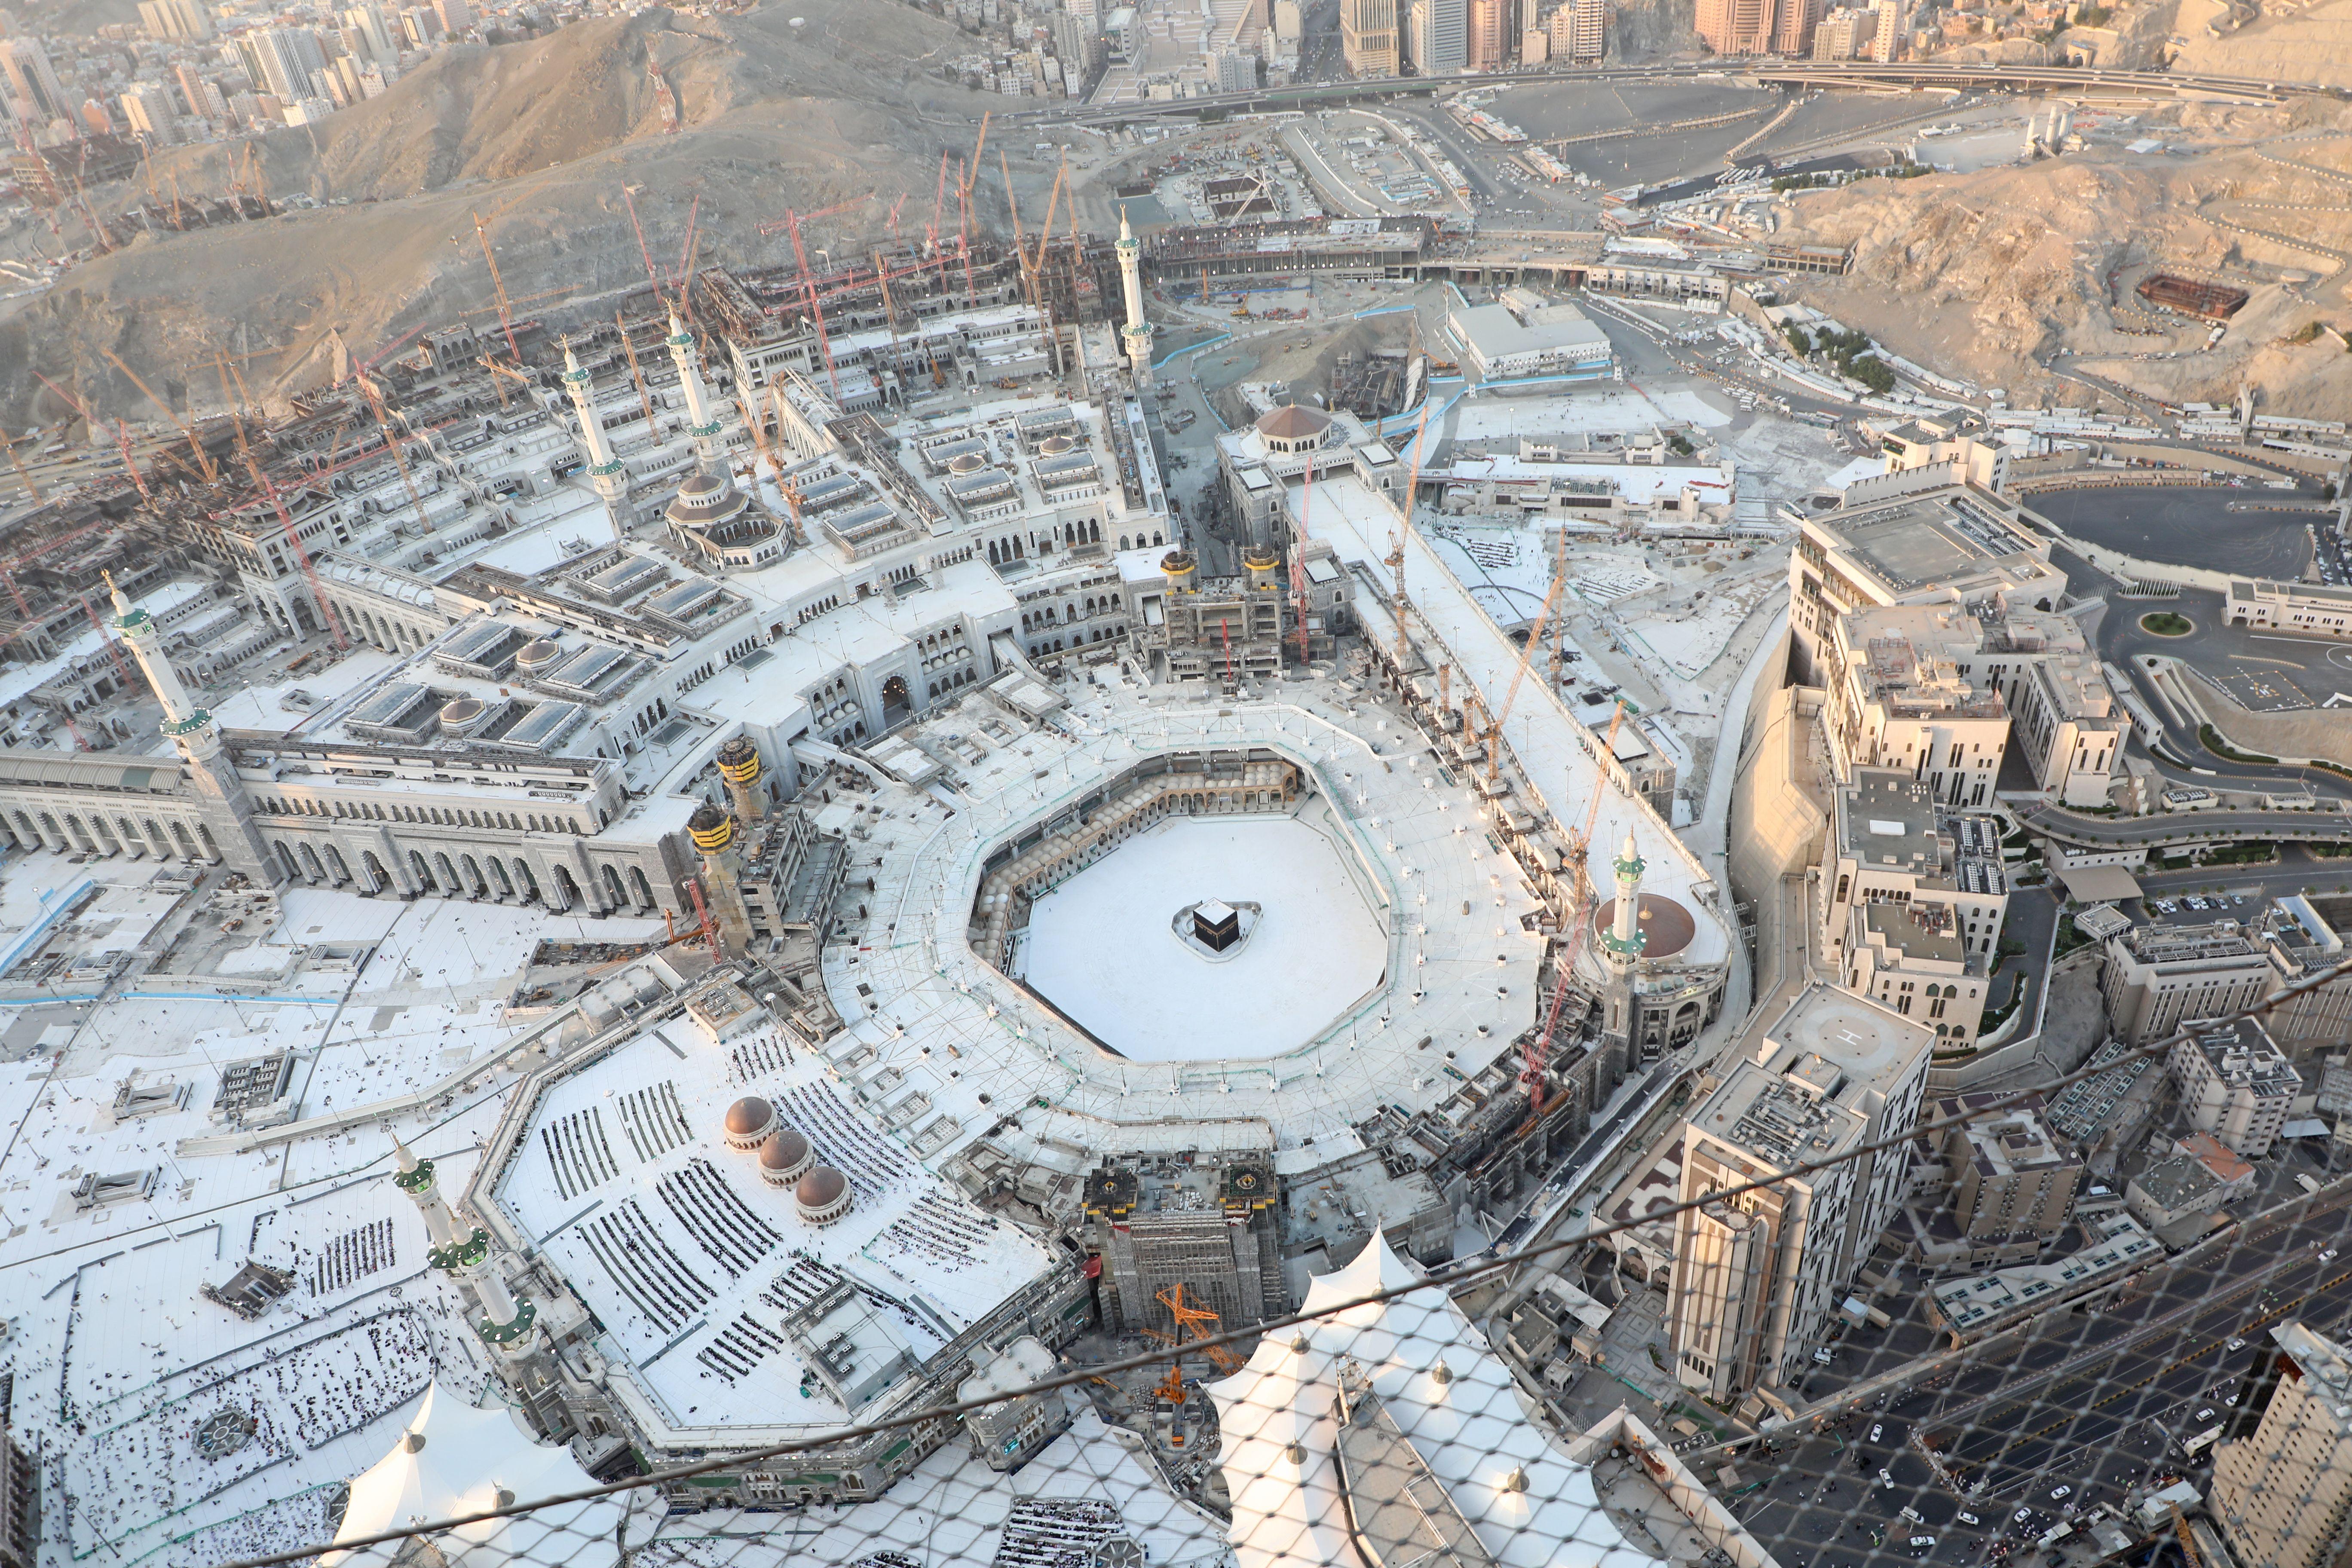 Saudi Arabia Temporarily Bans Pilgrimage To Mecca Amid Coronavirus Concerns Wgn Tv